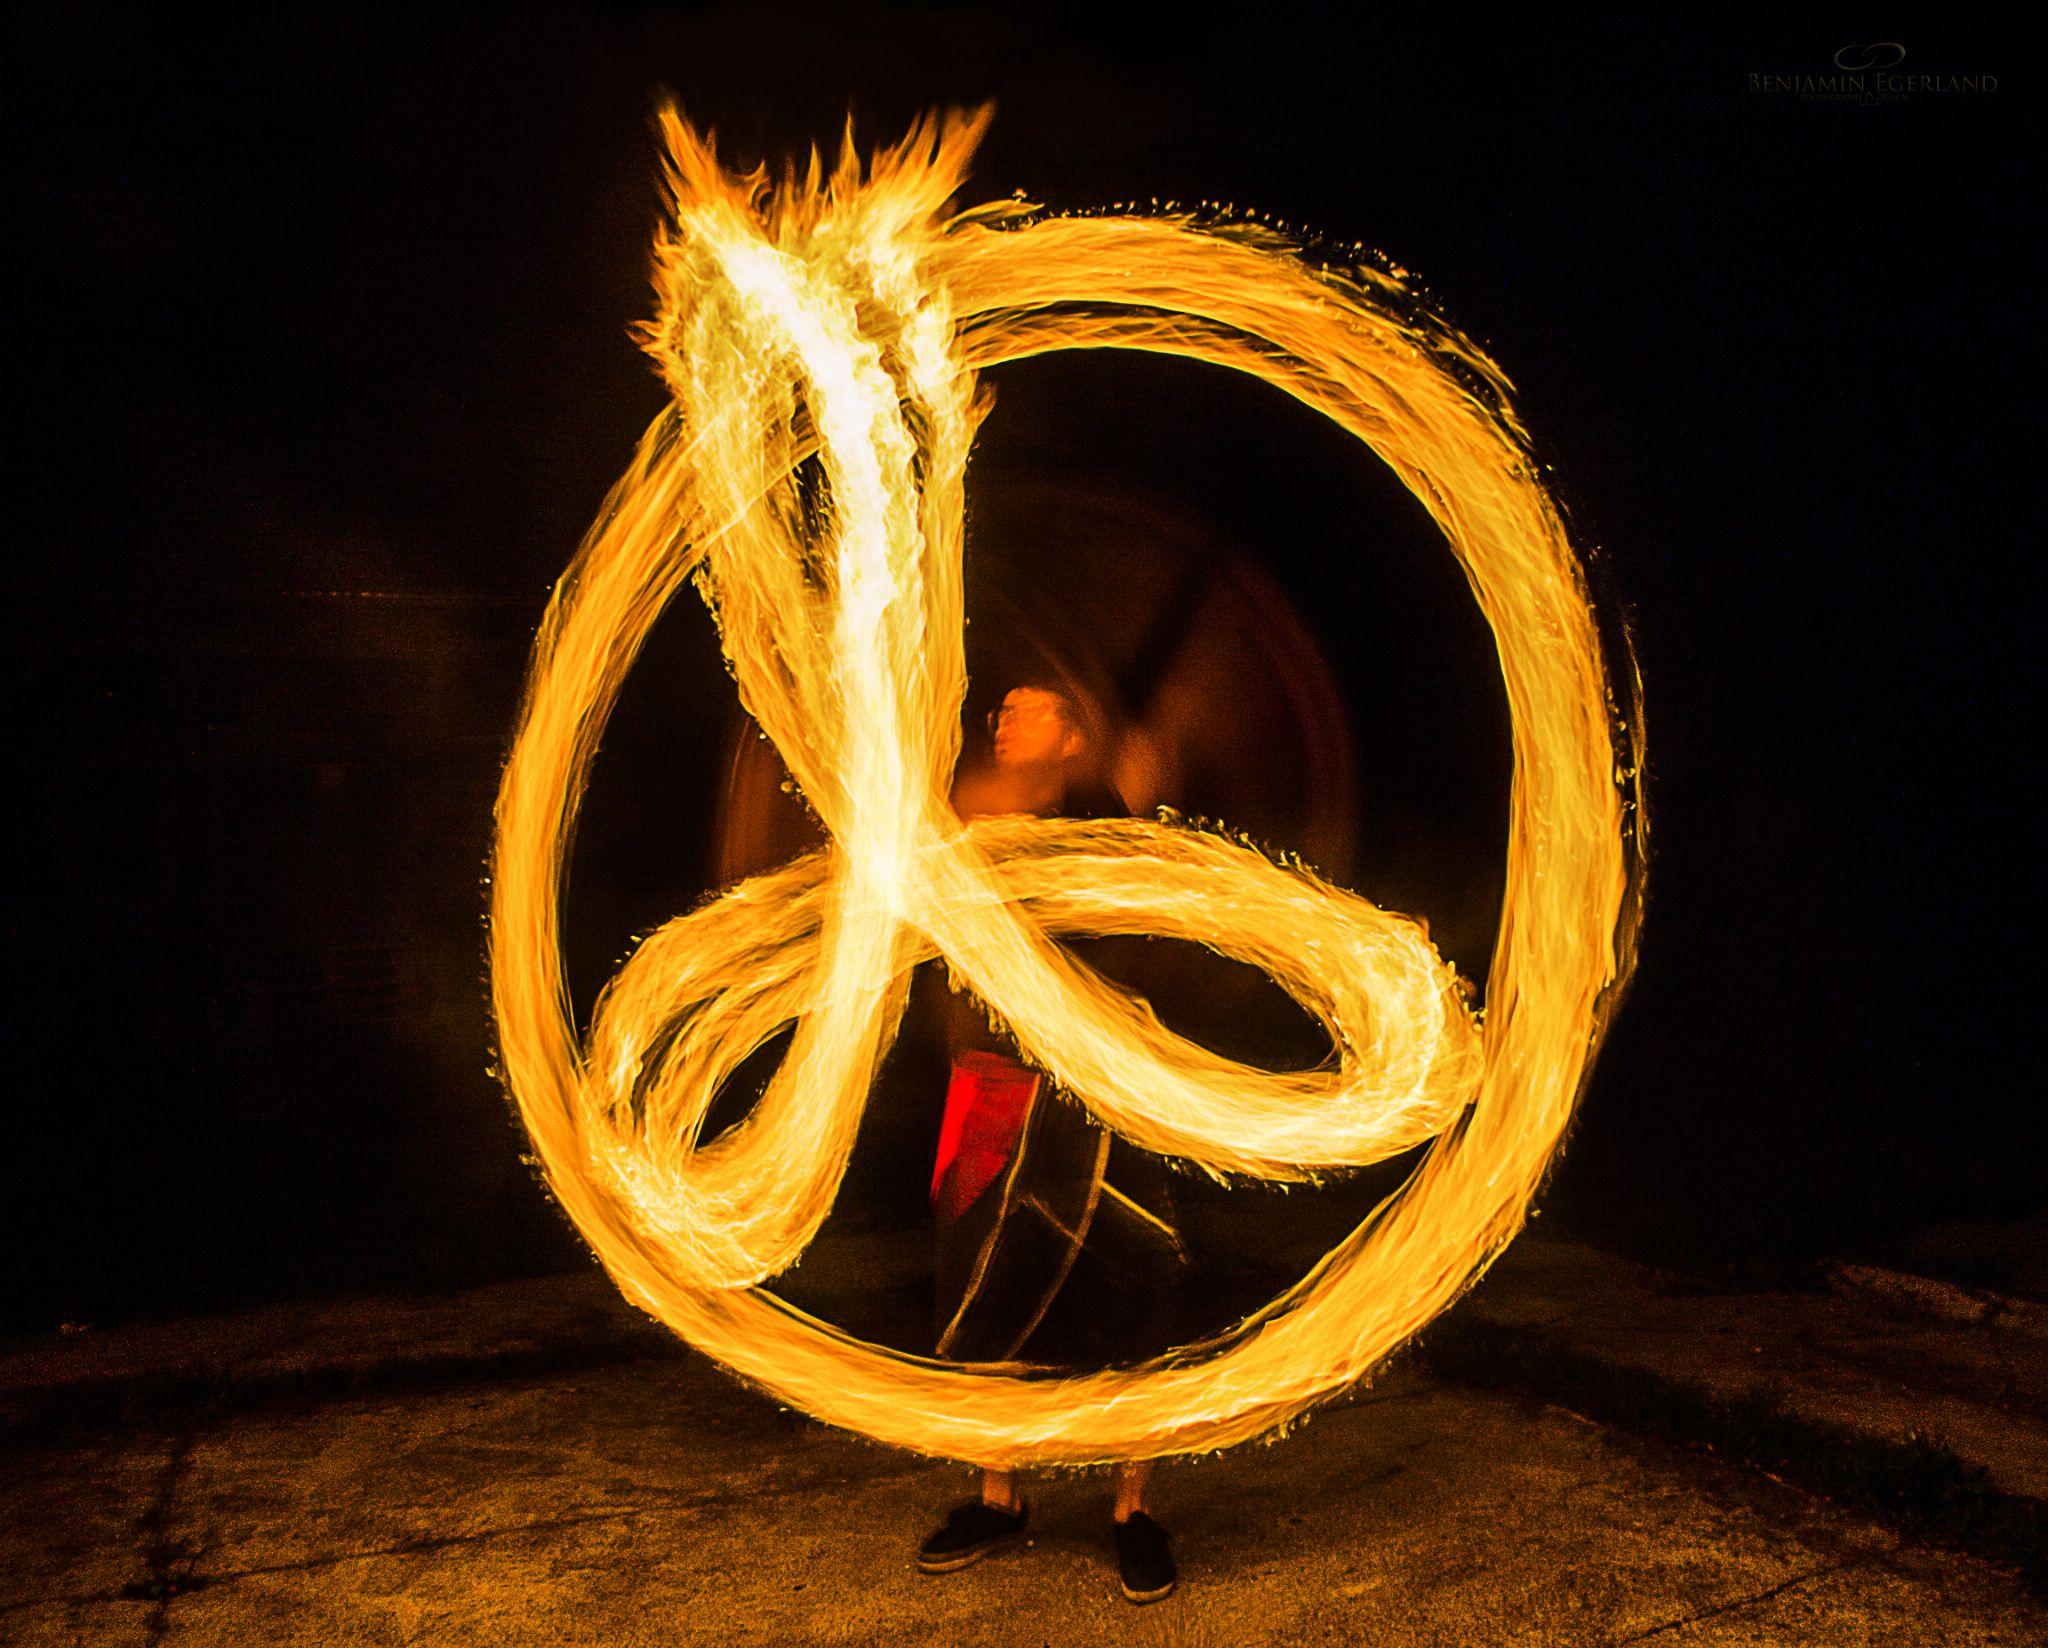 fire by benjamin.egerland